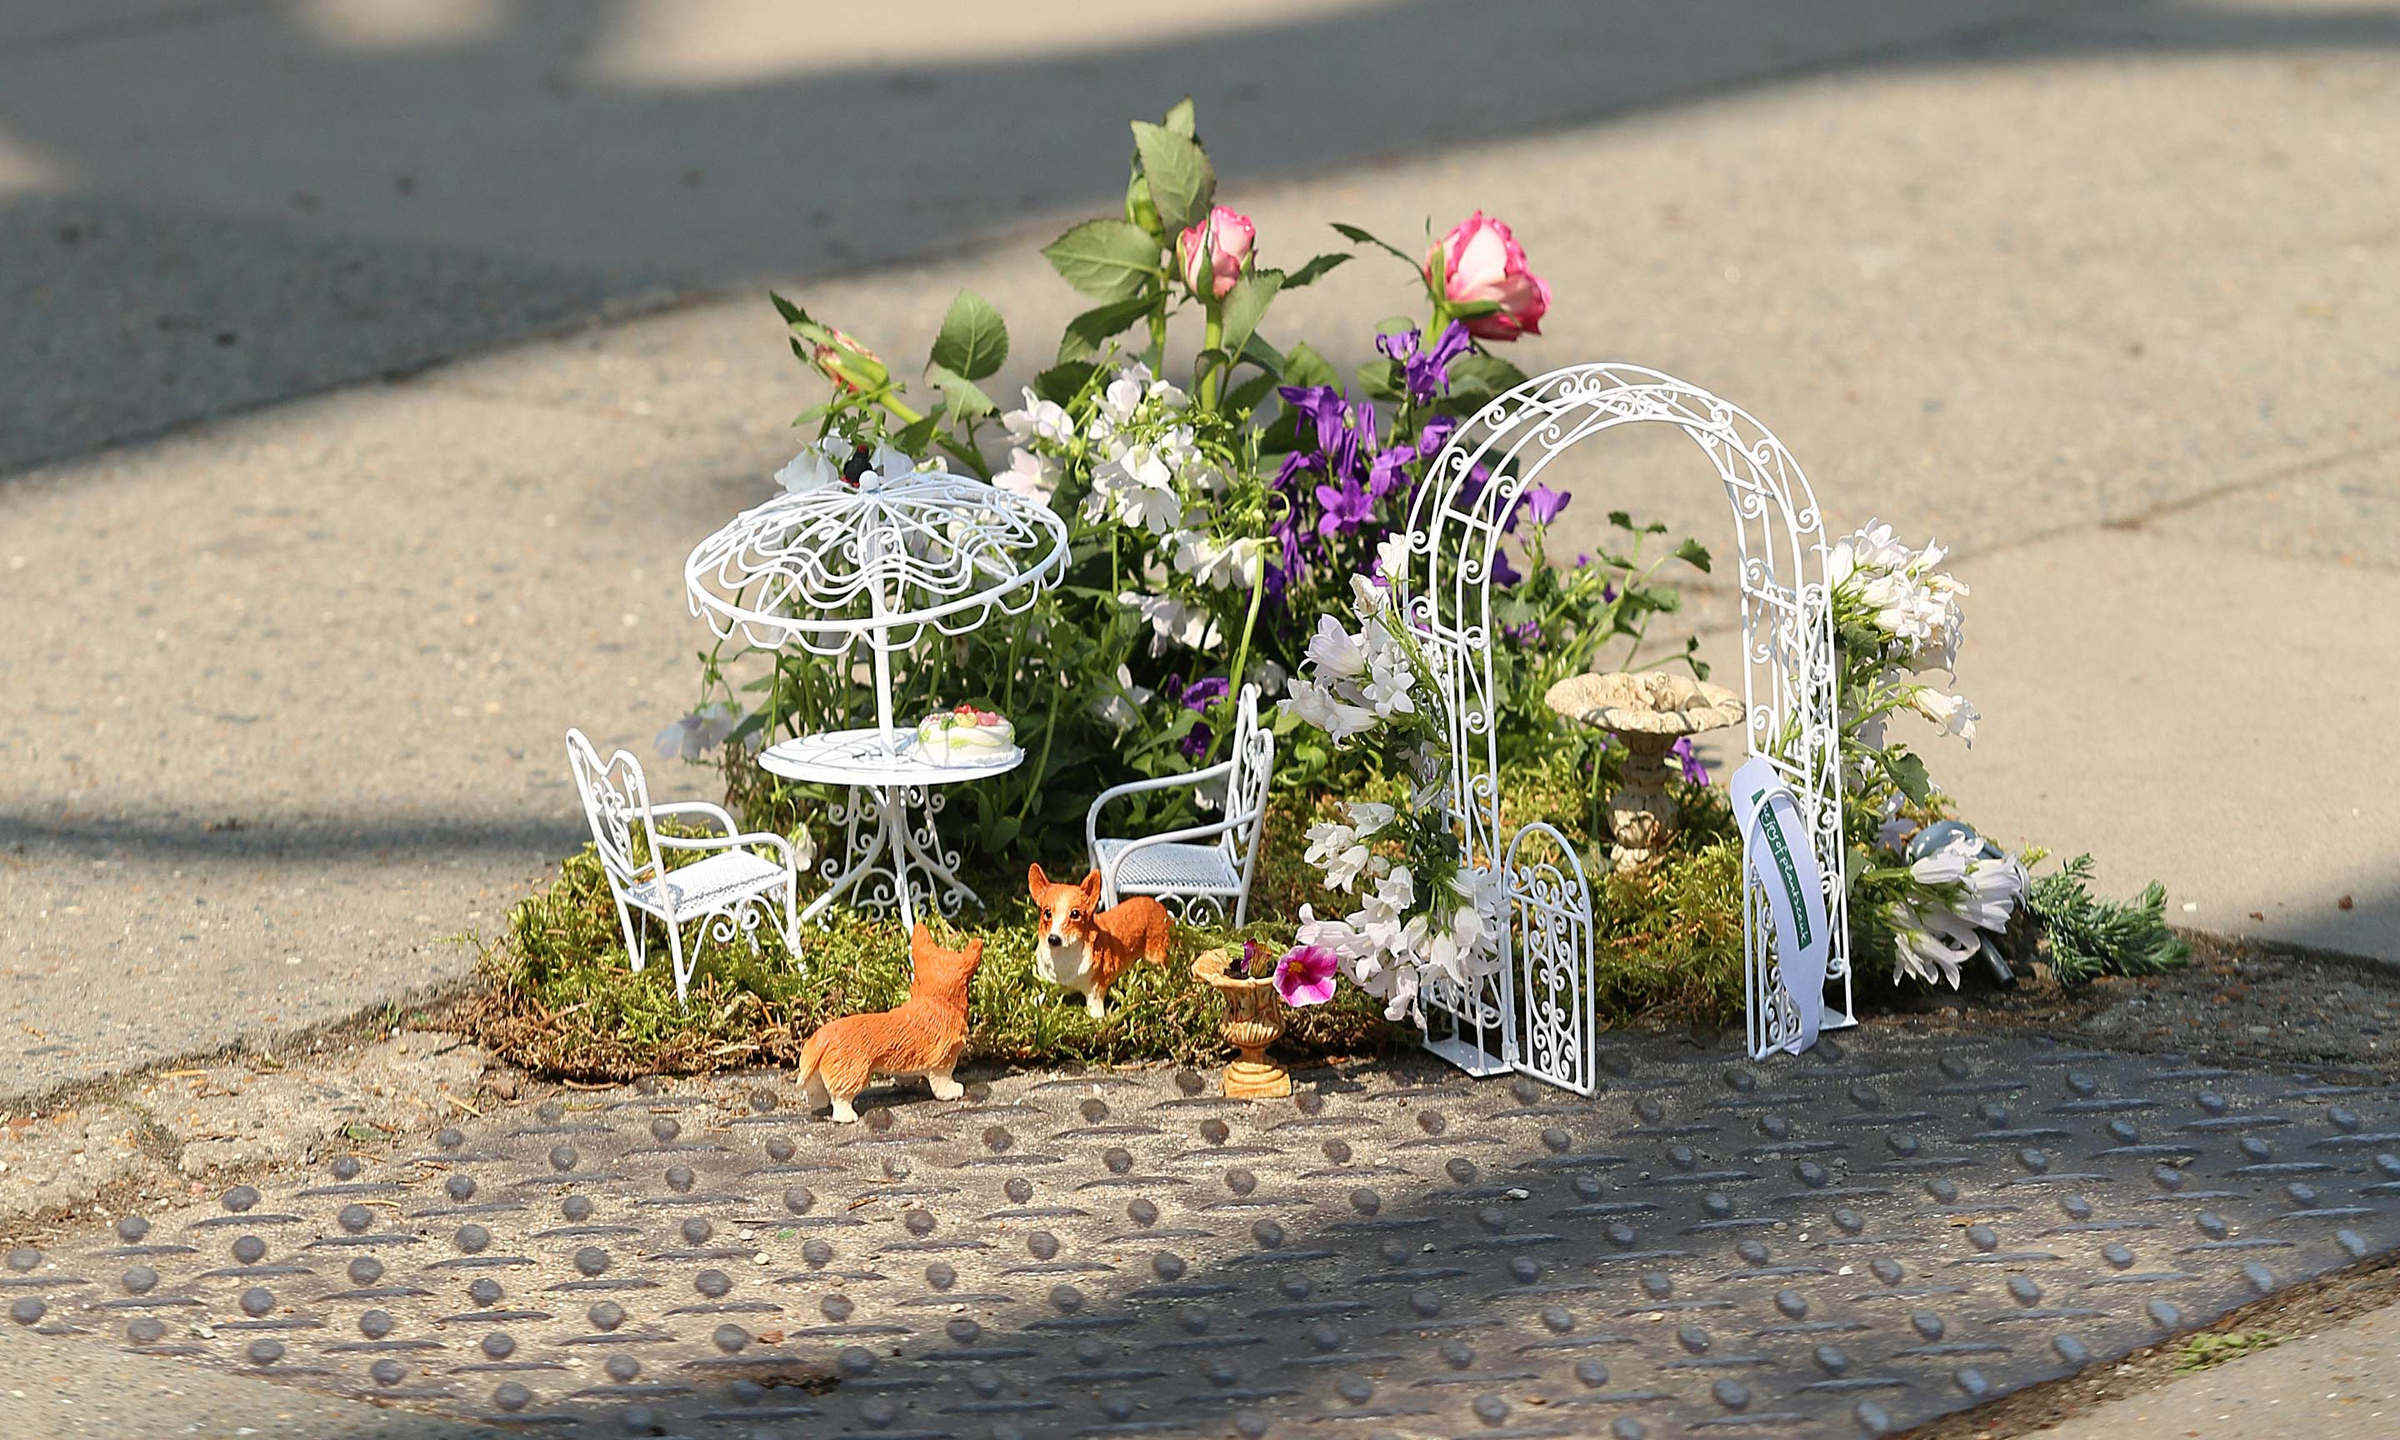 partyzantka ogrodnicza - The Pothole Gardener